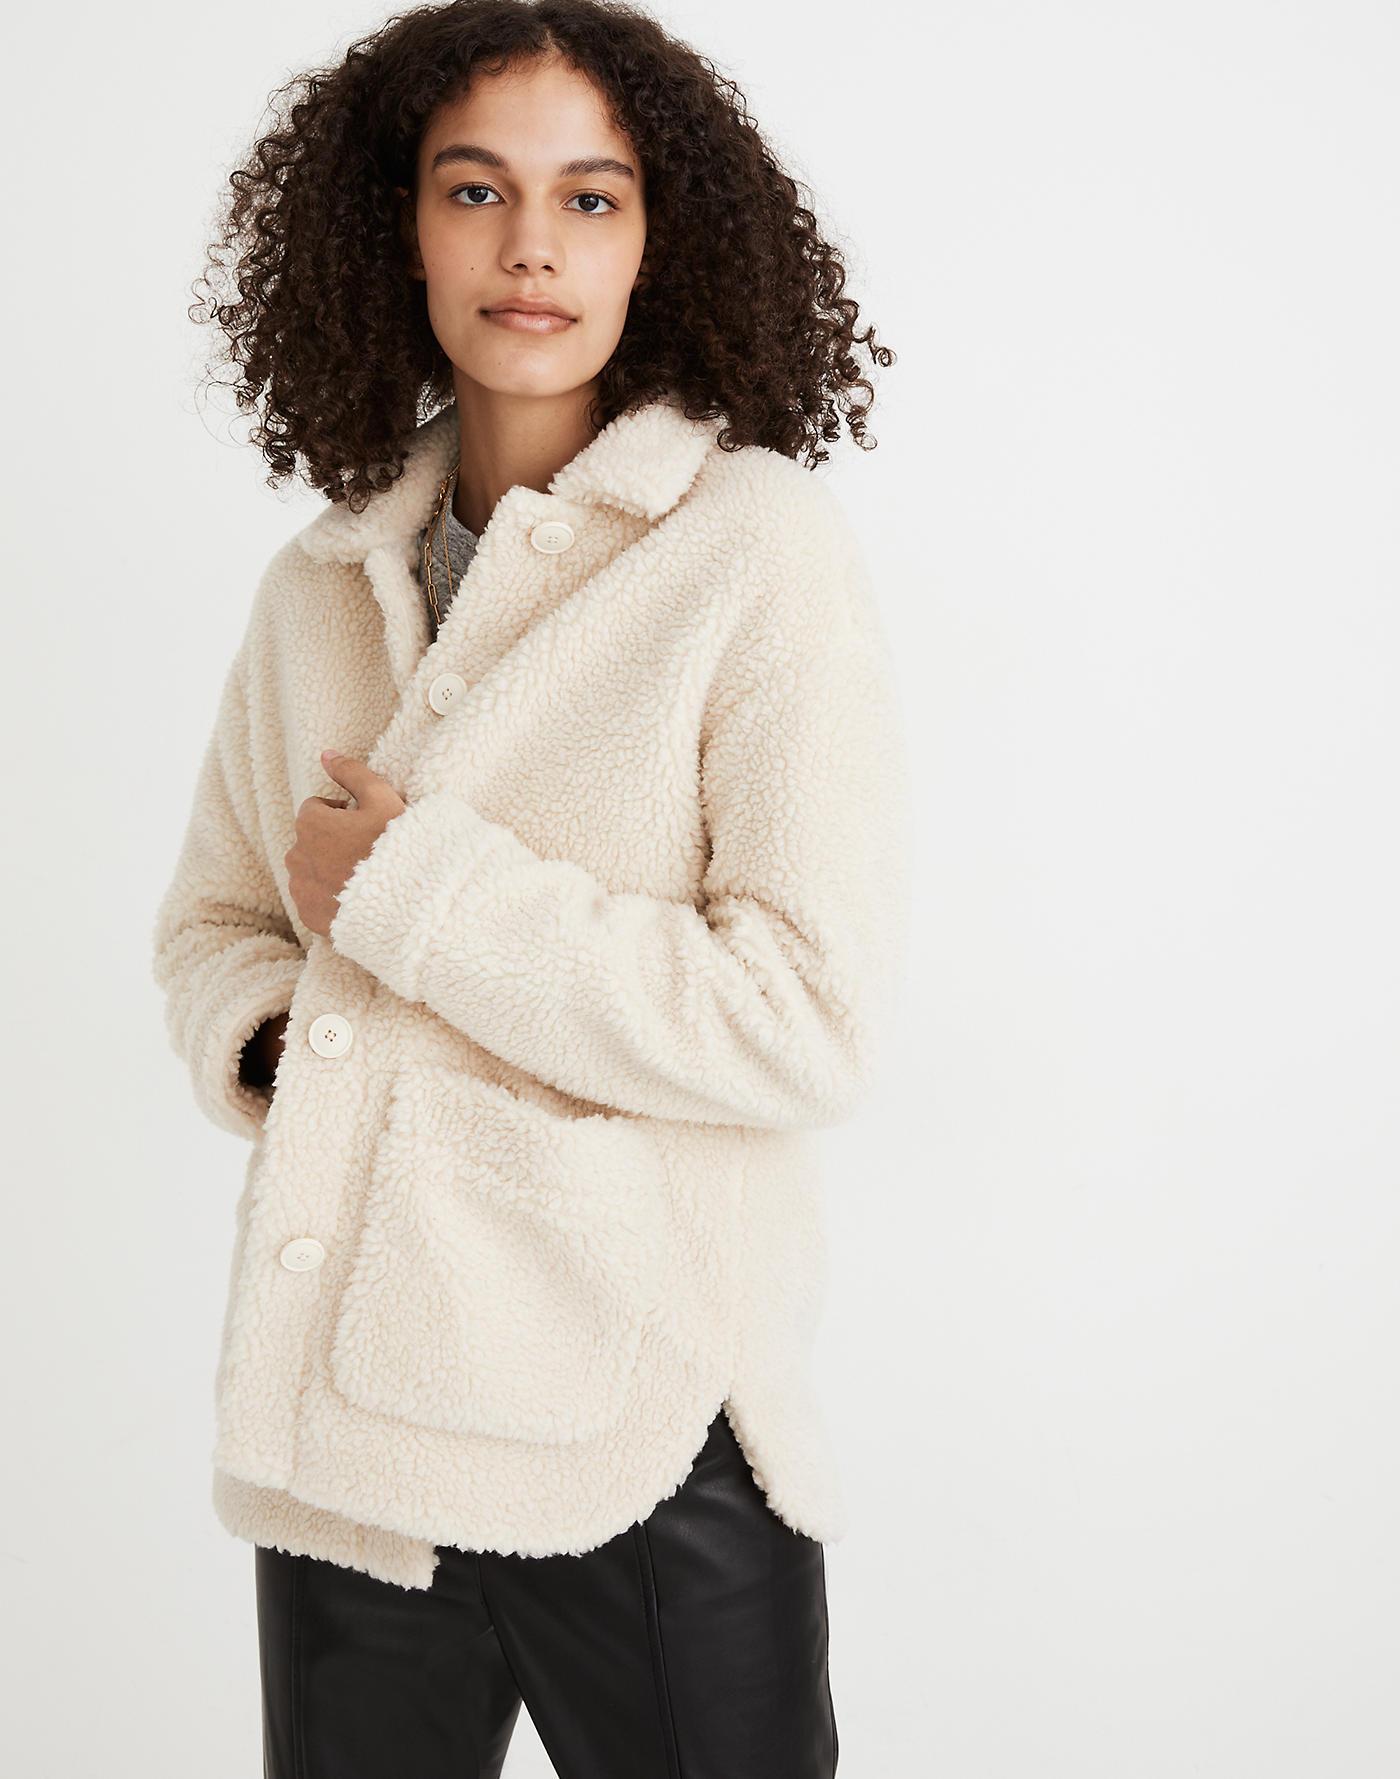 Madewell sherpa shirt-jacket